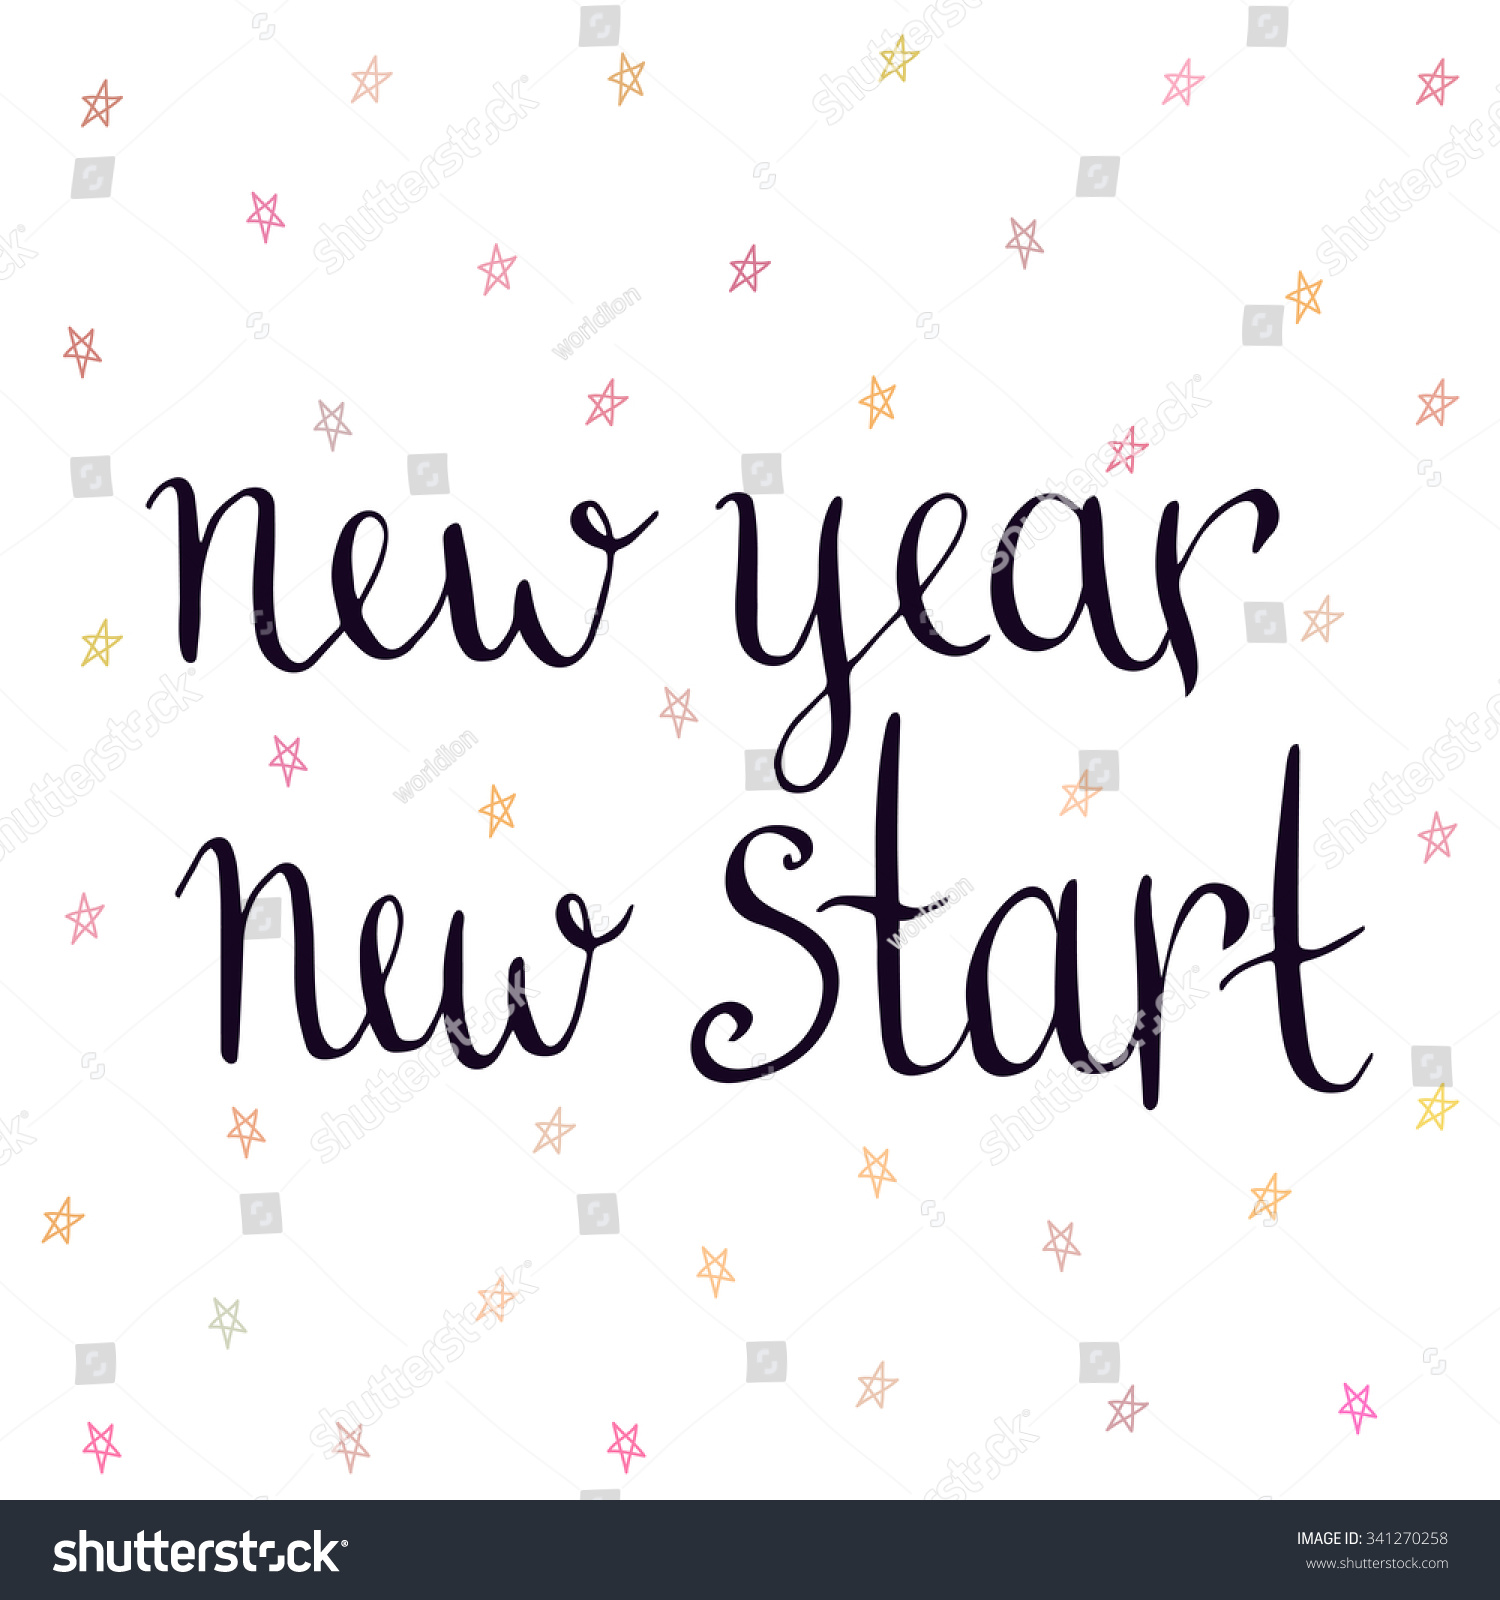 New Year New Start Inspirational Motivational Stock Vector (Royalty ...